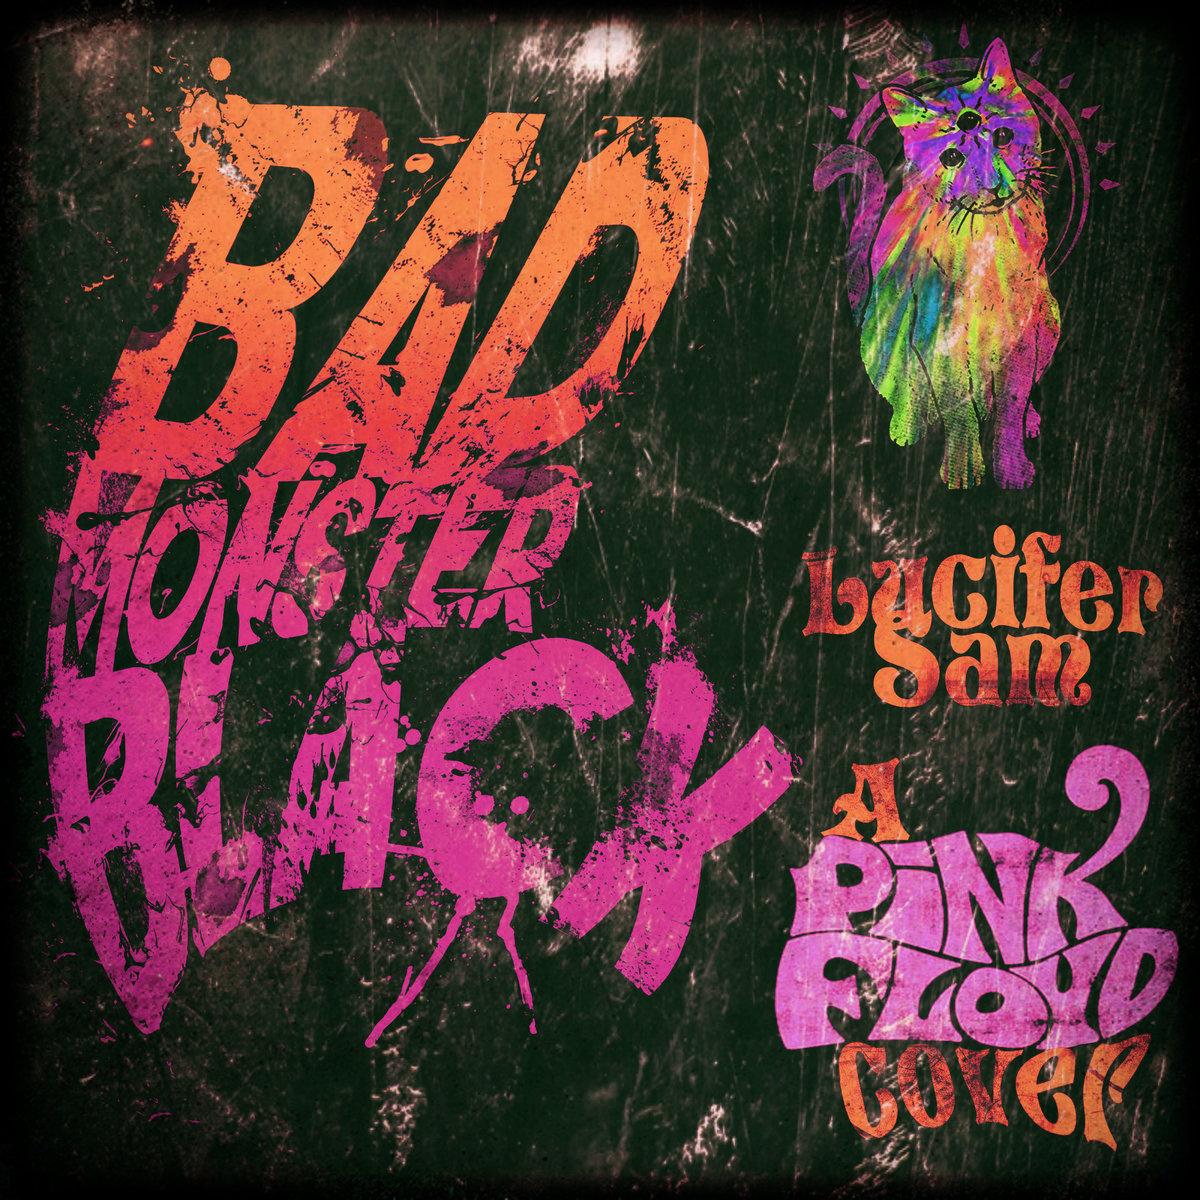 Lucifer Sam (Pink Floyd Cover)